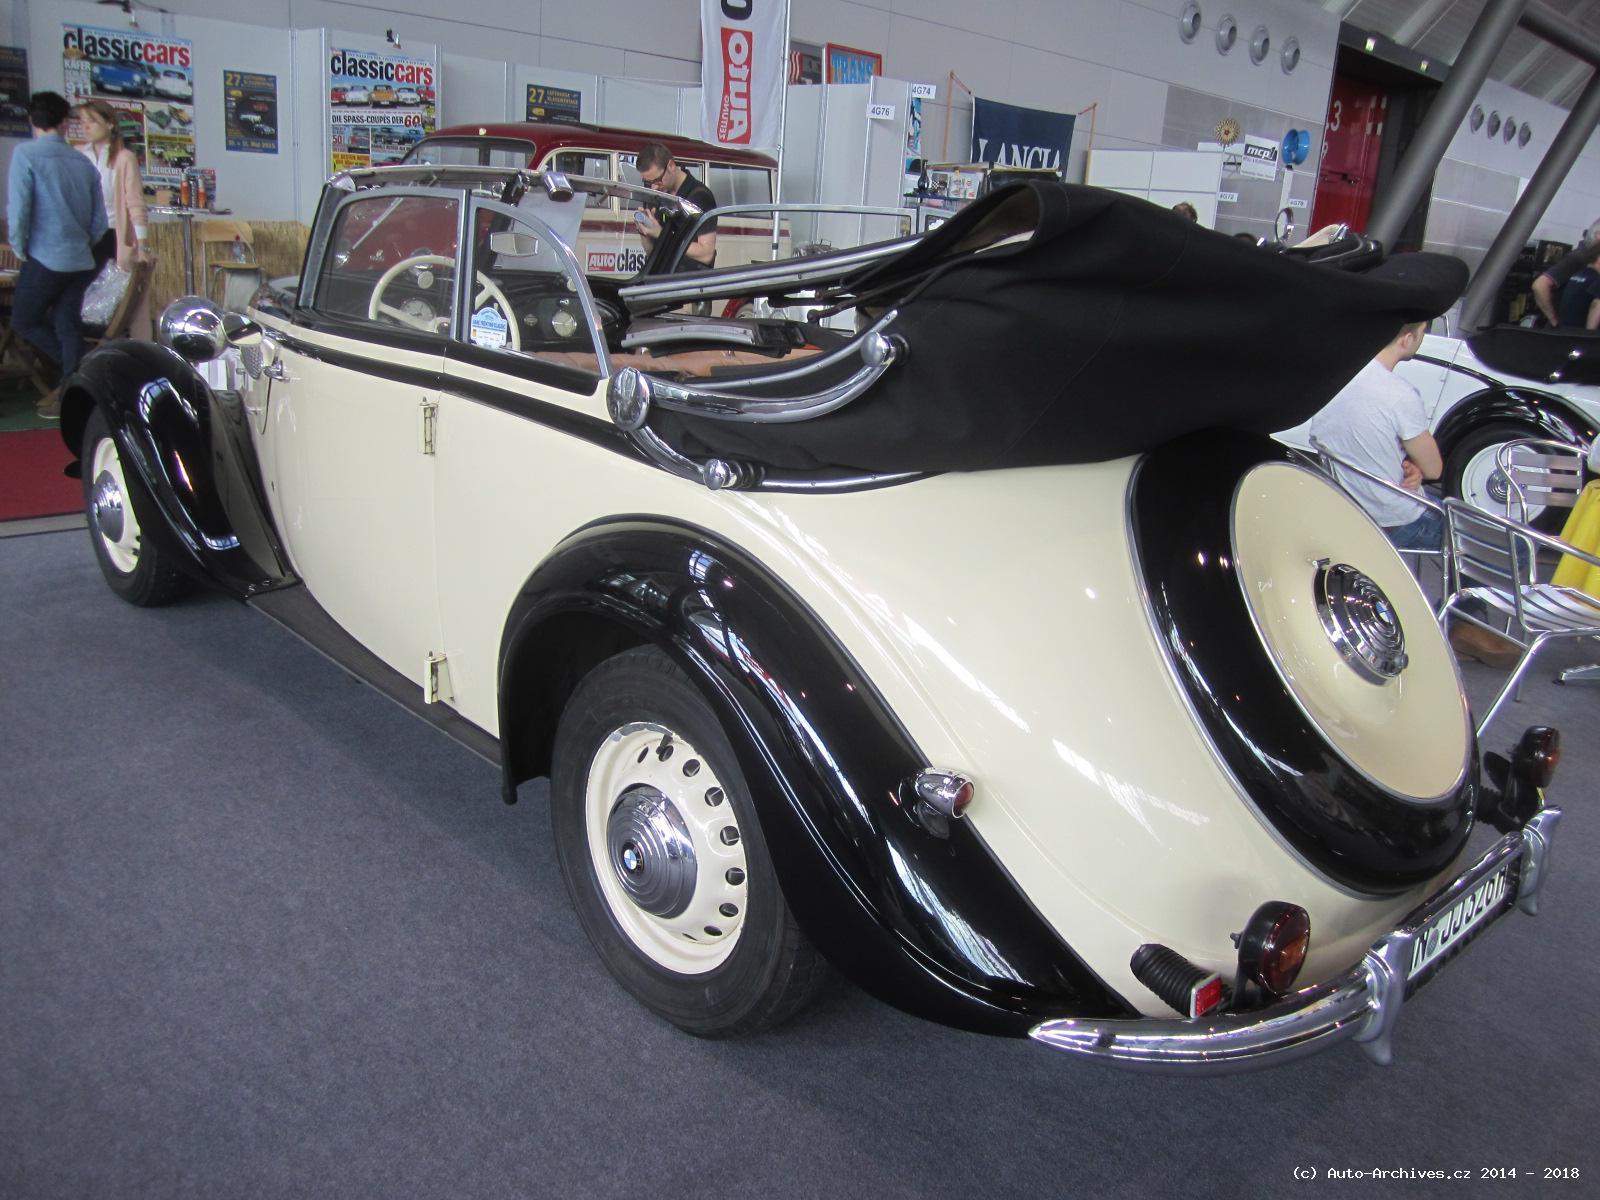 Retro Classic Stuttgart 2015 (1) | Auto Archives